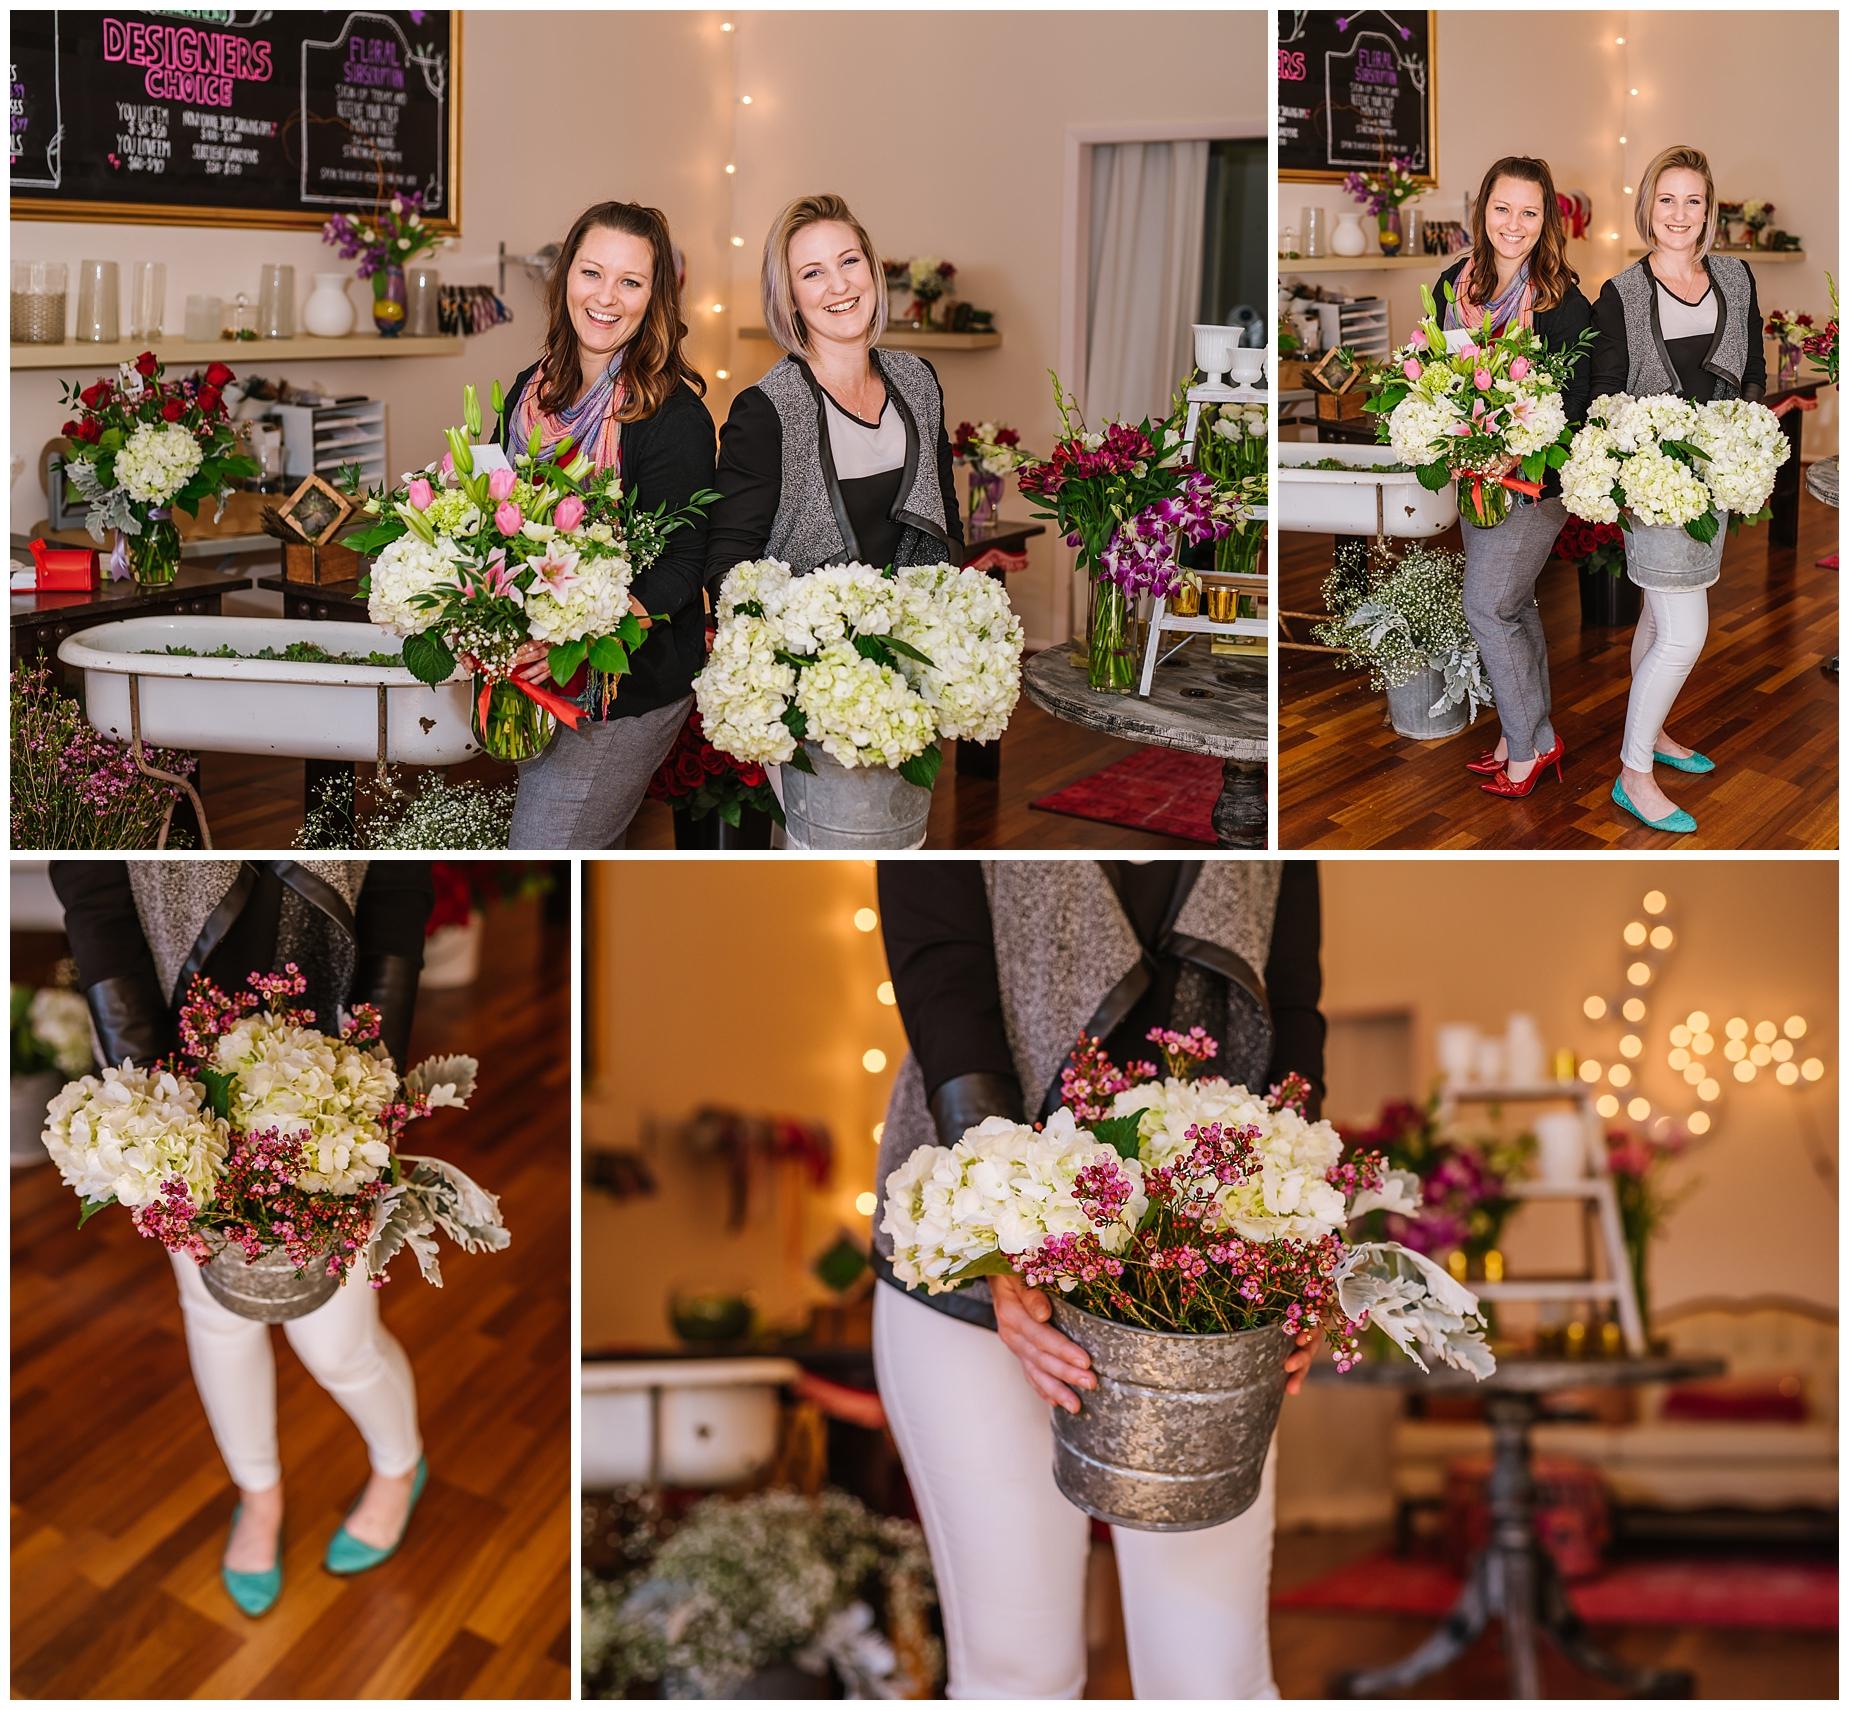 tampa-wedding-photographer-hyde-park-village-florist_0020.jpg